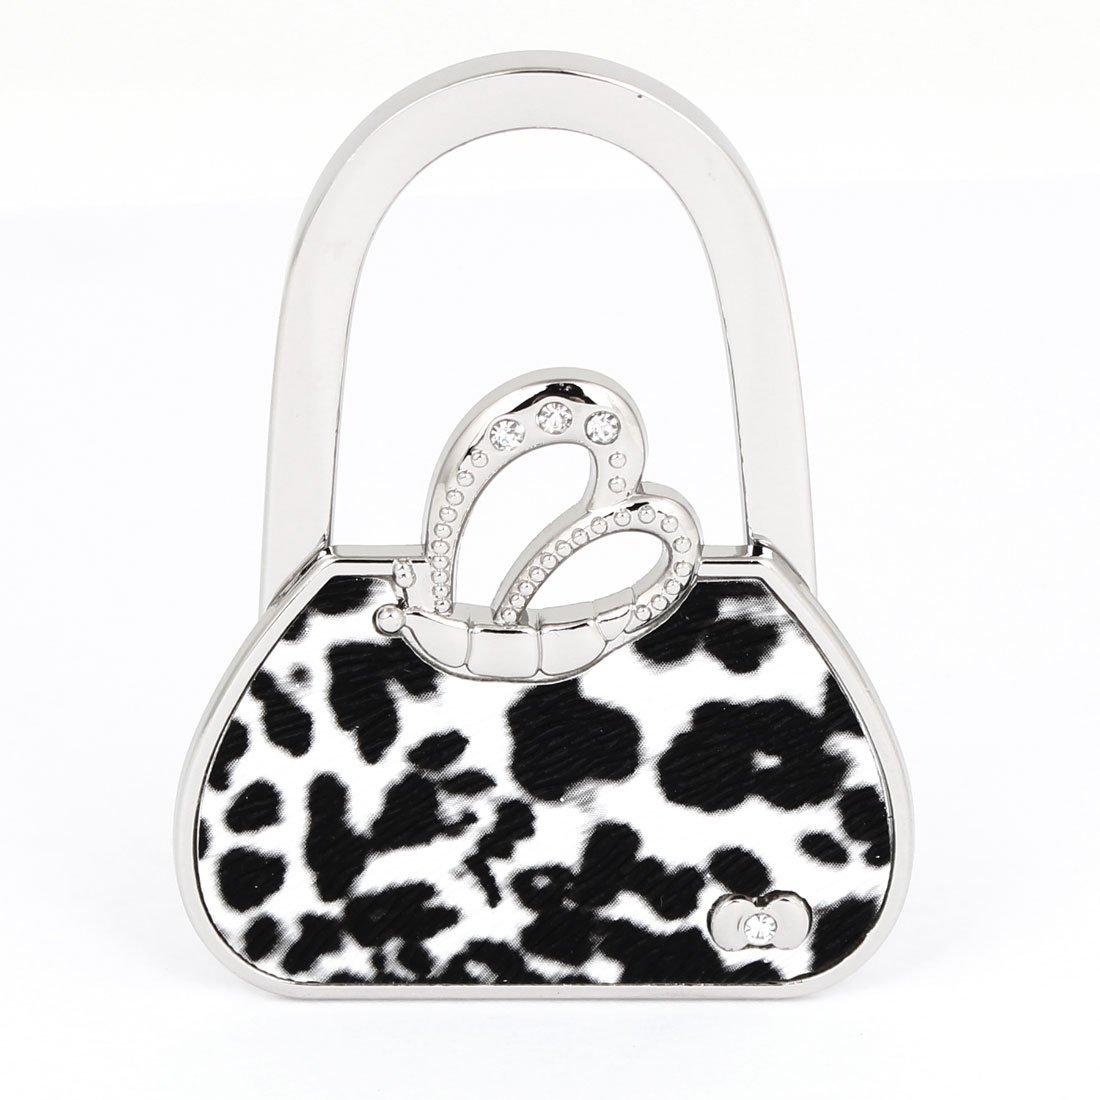 SZS Hot Leopard Print Handbag Style Foldable Table Hook Purse Hanger Holder(China (Mainland))